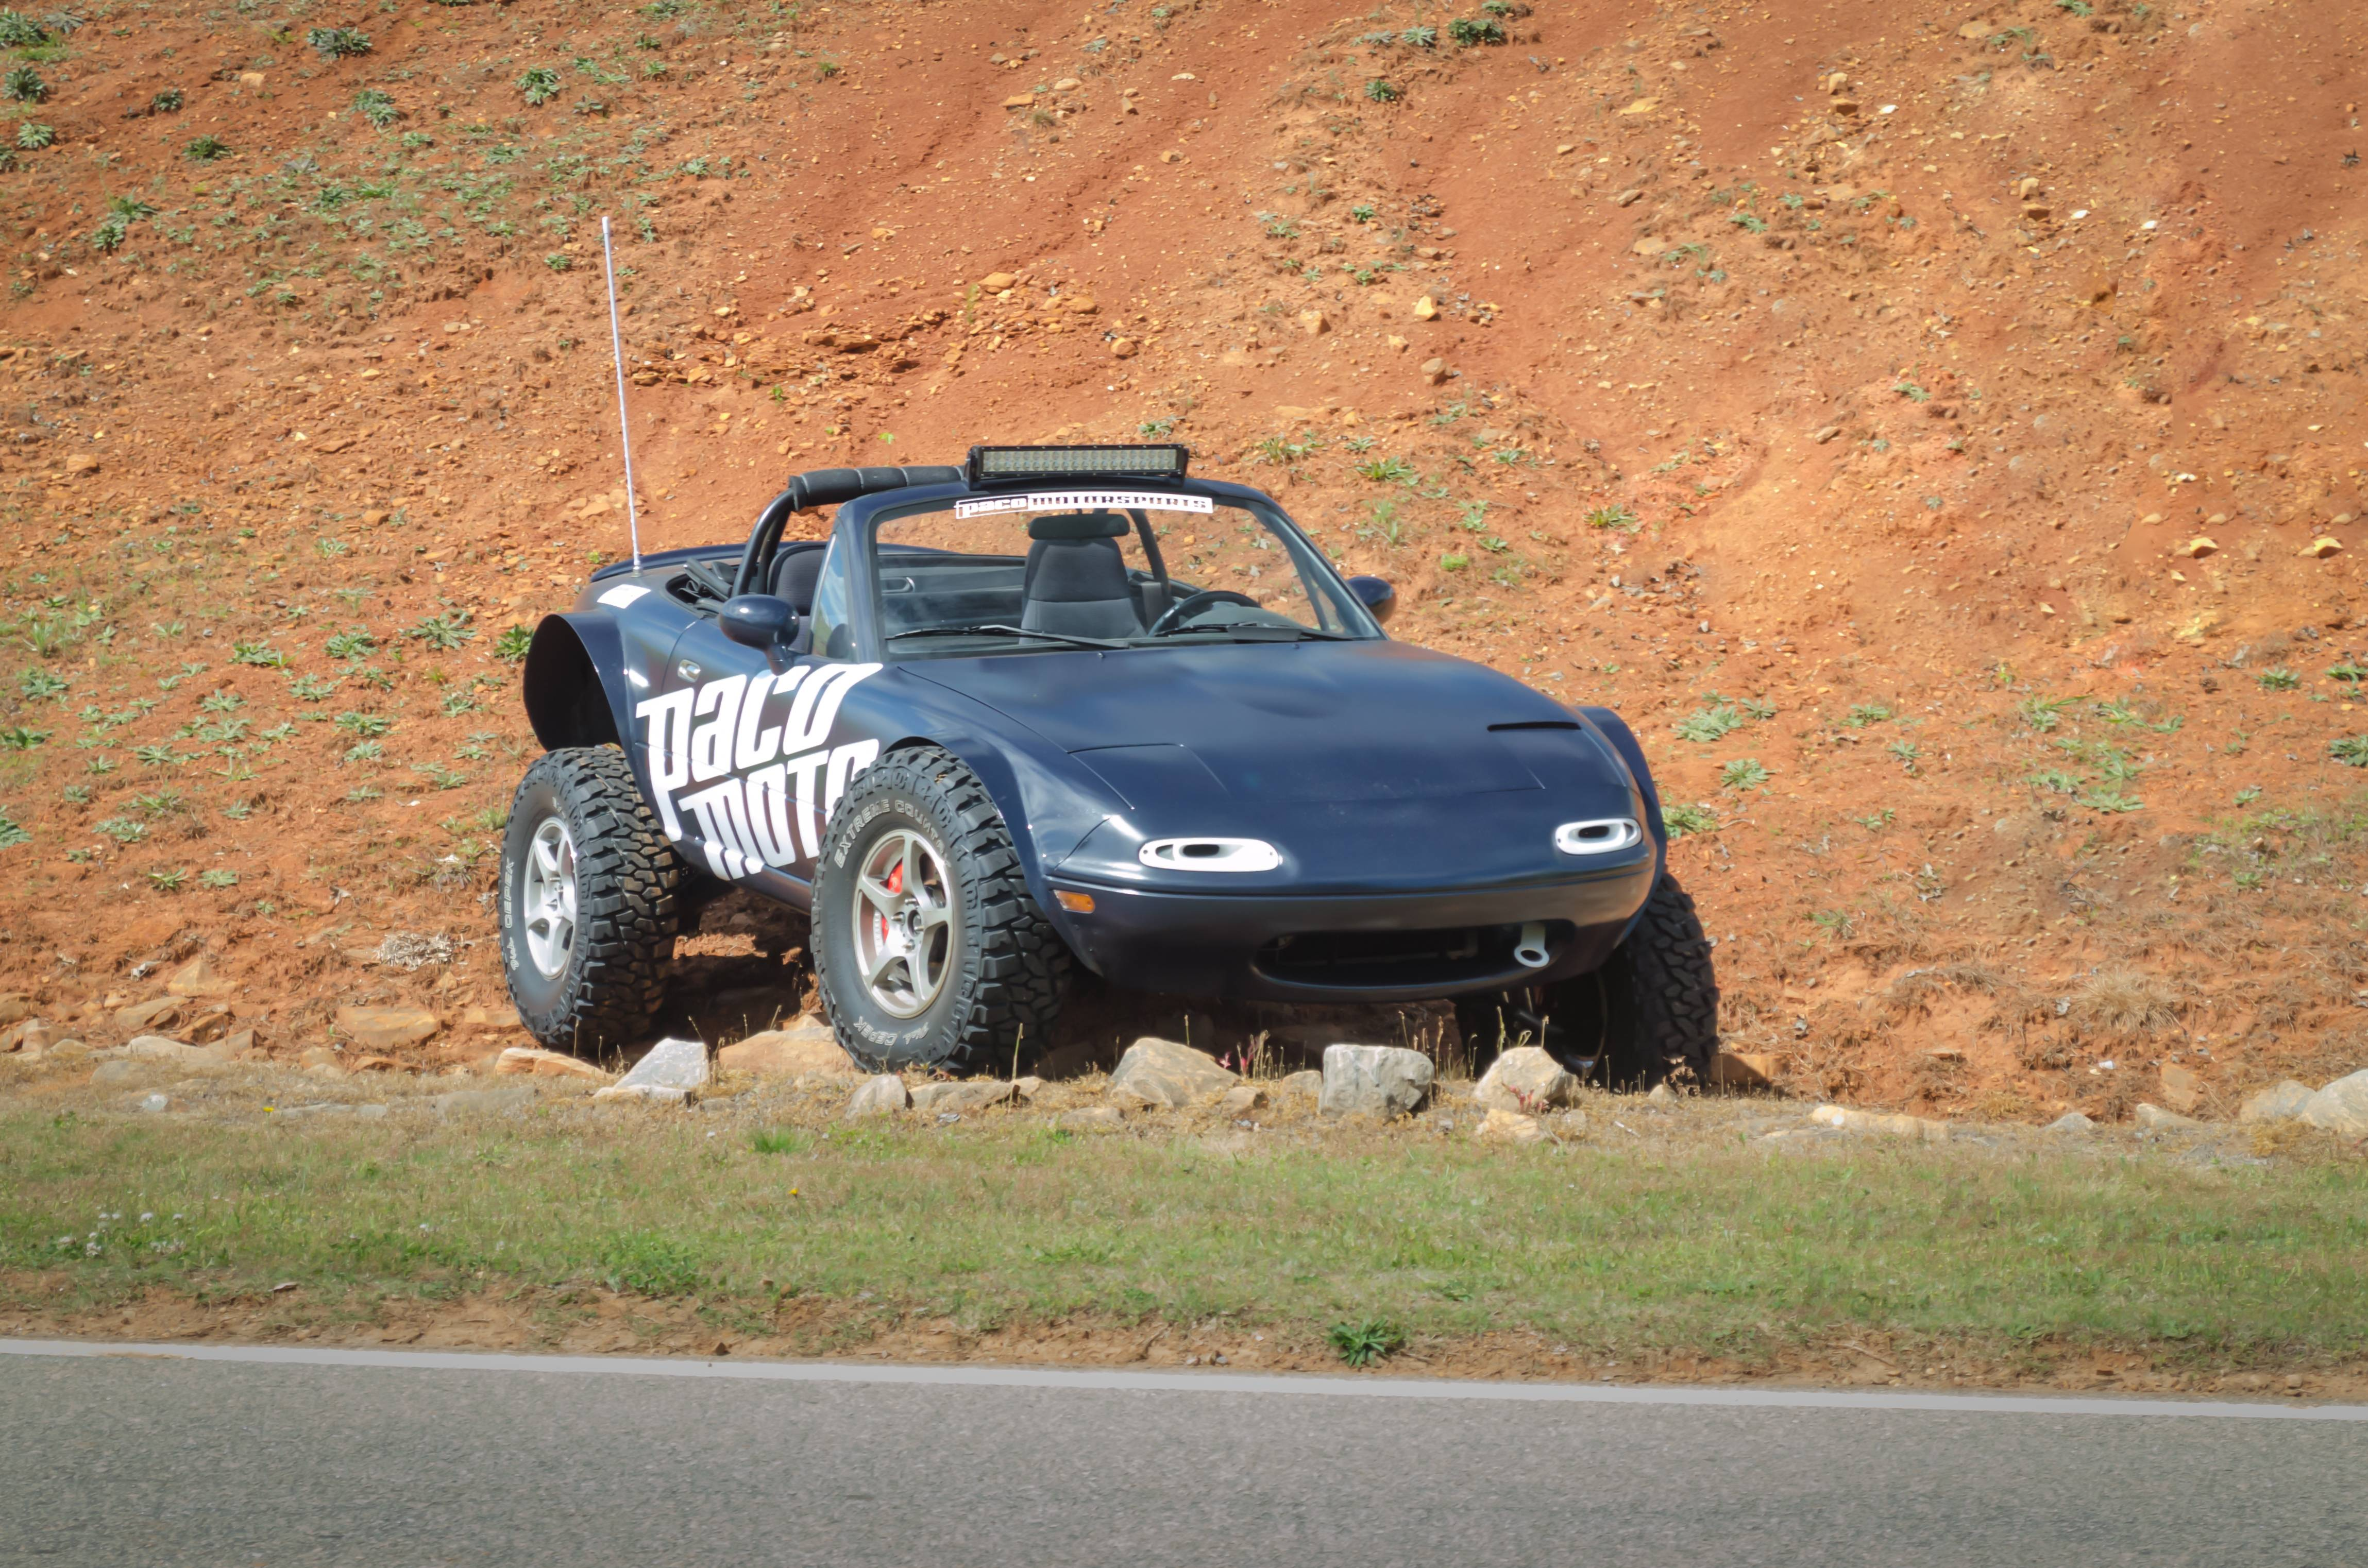 Lifted Mazda Miata Is the Awesome Baja Sportscar autoevolution